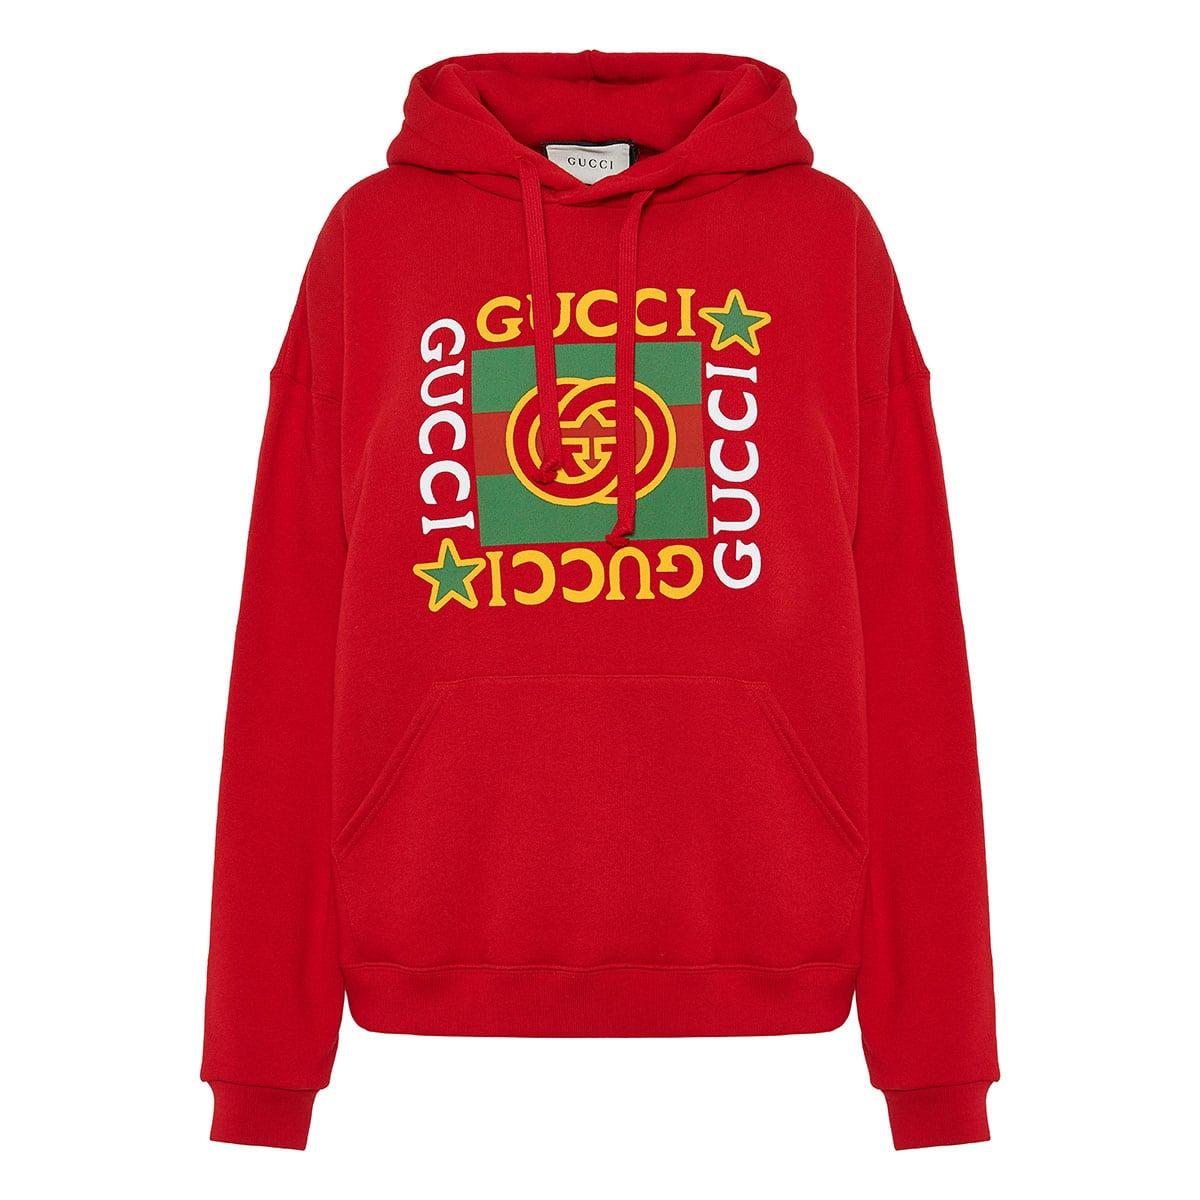 Oversized logo hoodie